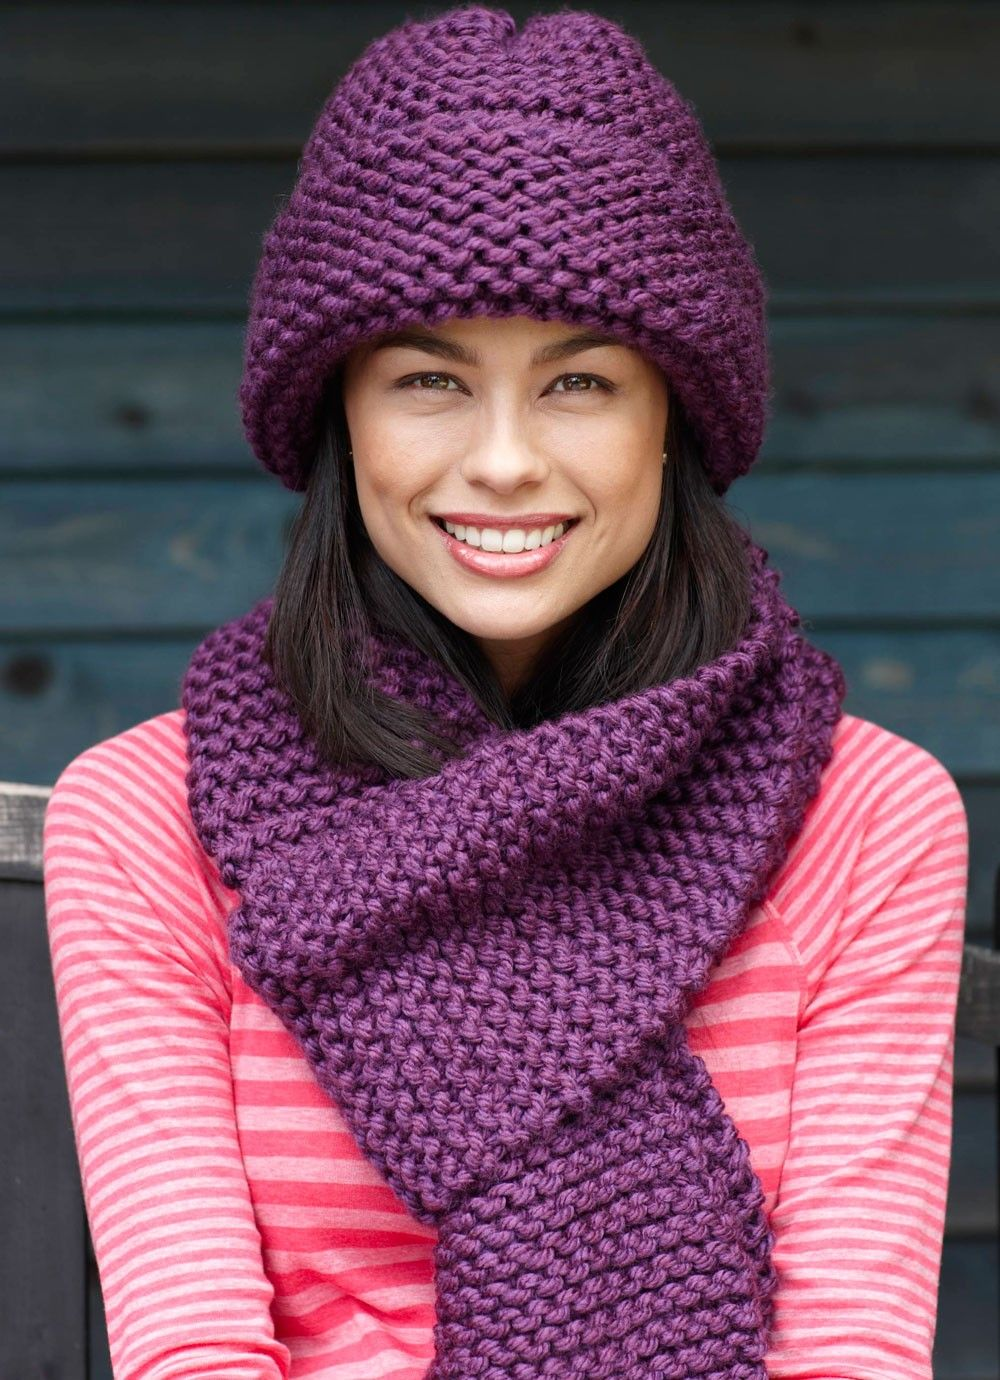 Beginner Scarf Pattern (Knit) | вязаные шапки | Pinterest | Scarf ...